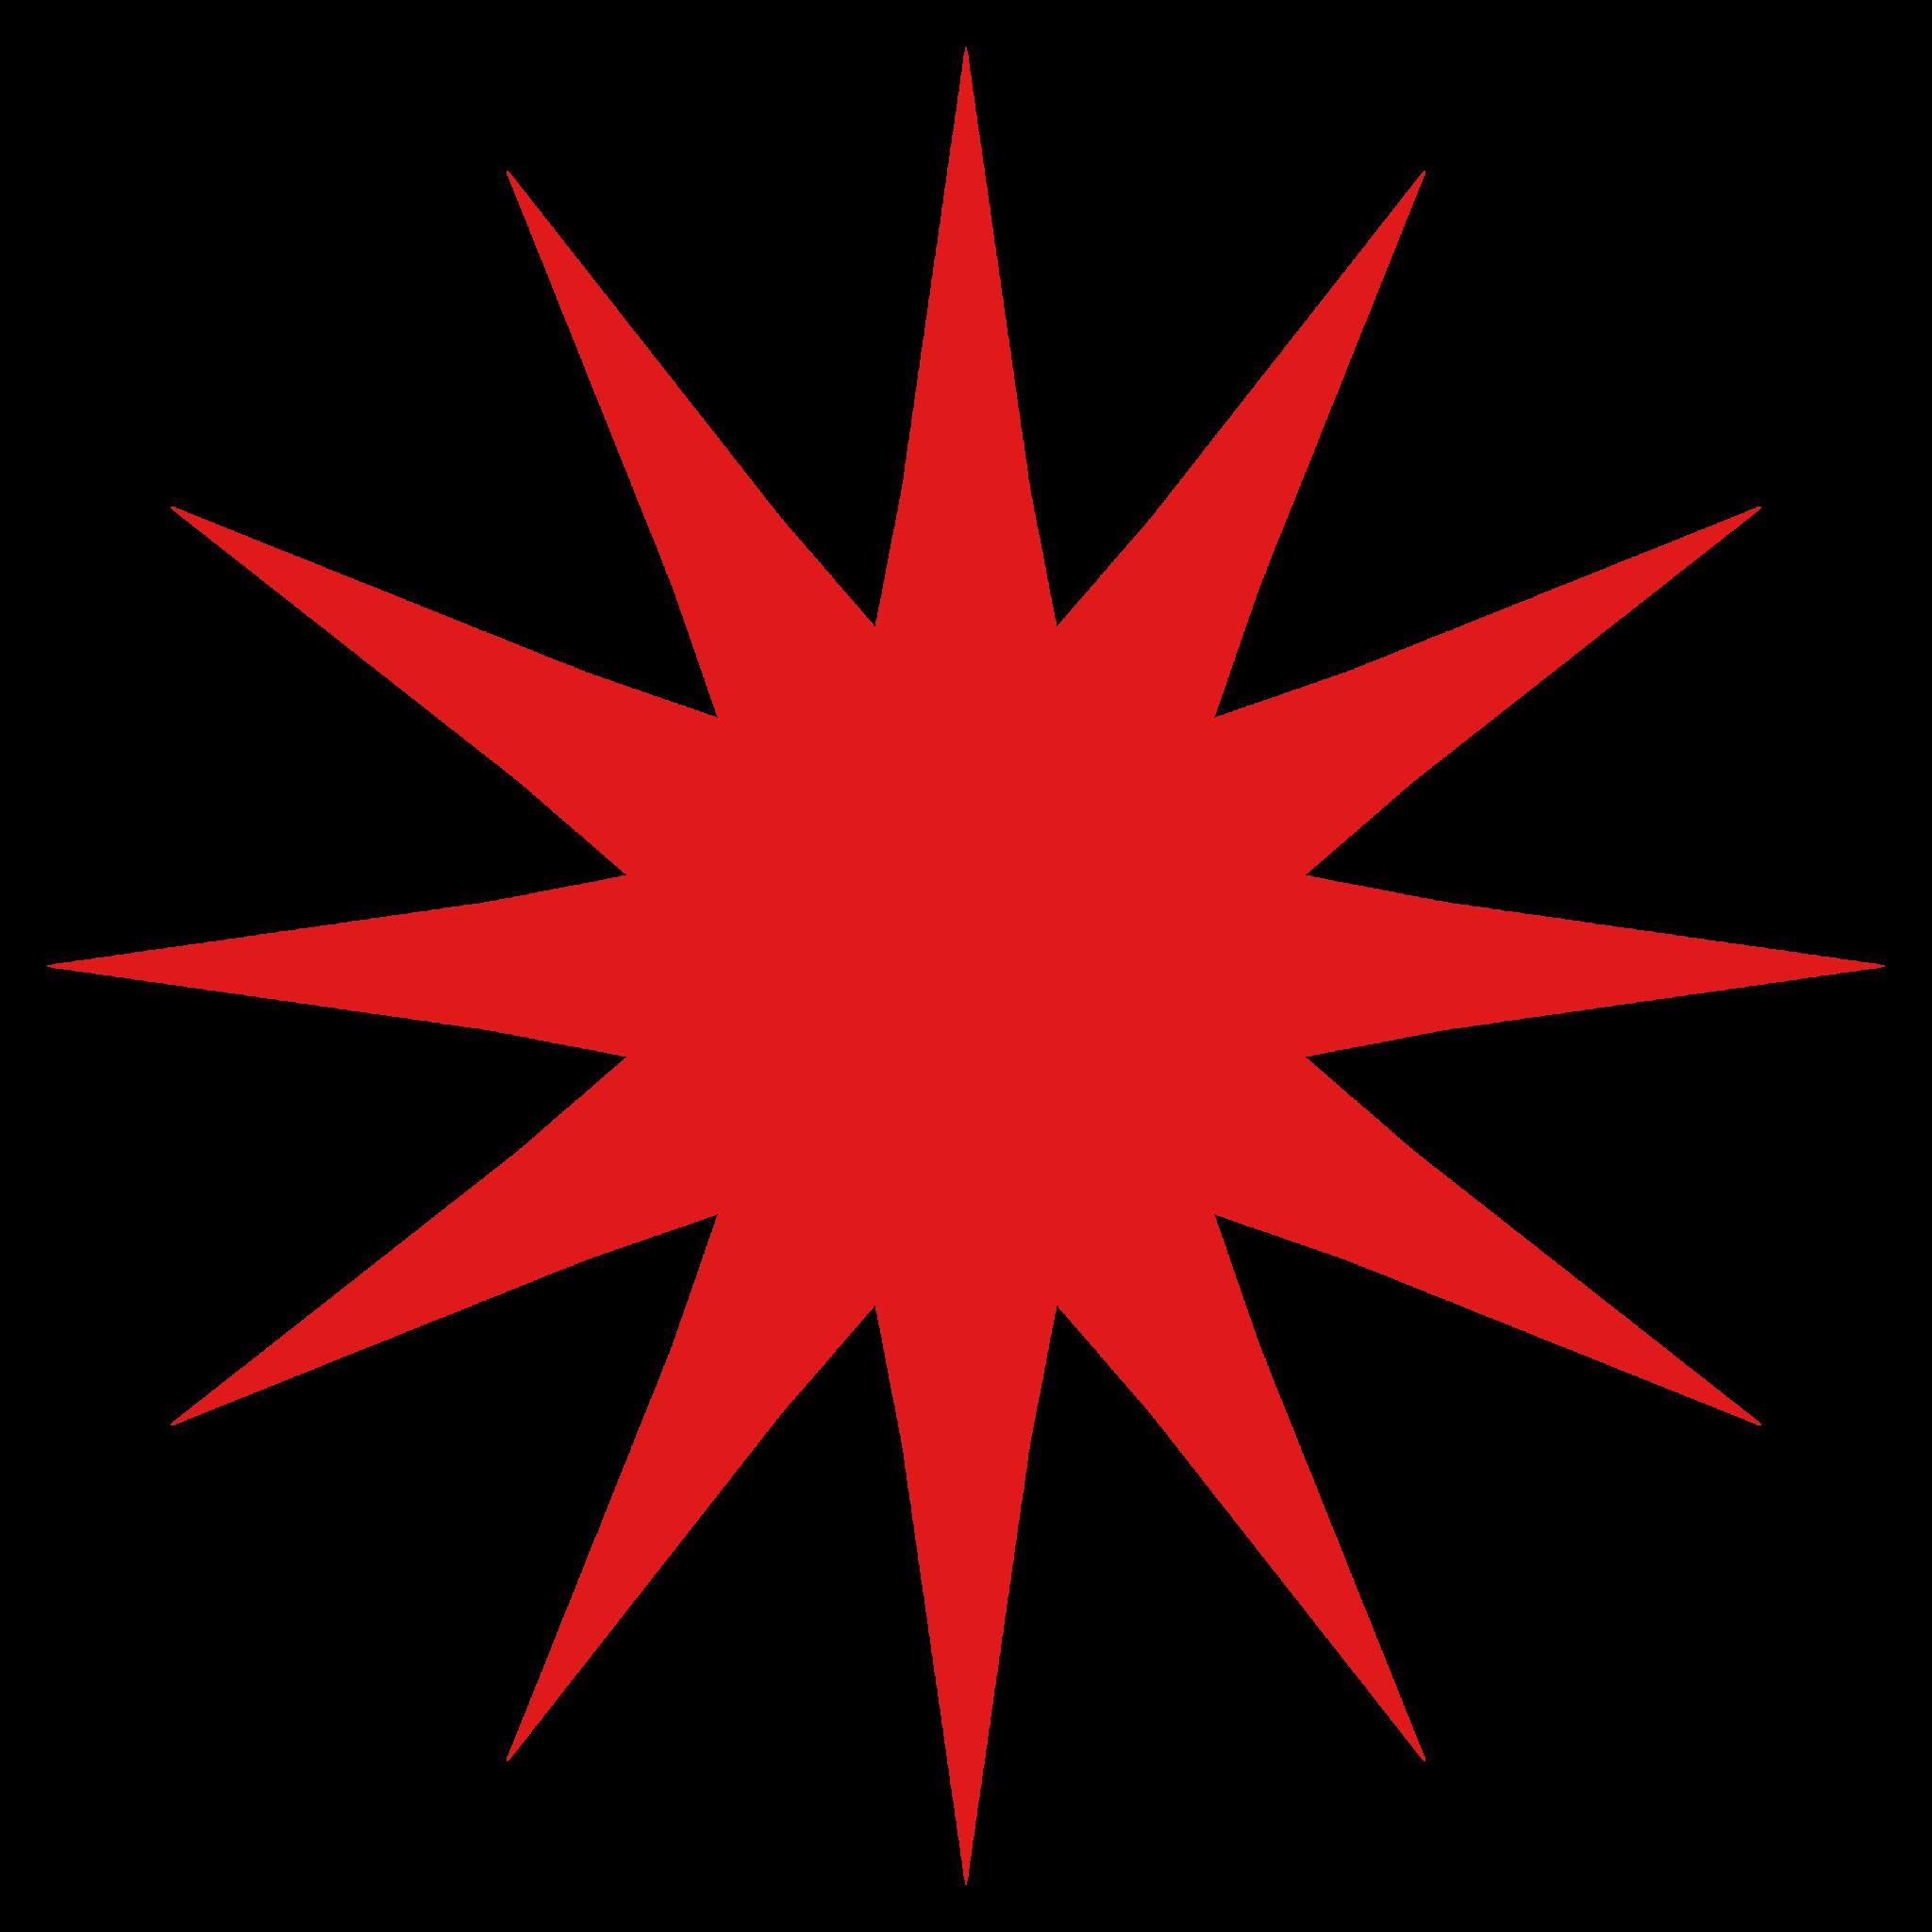 star,template,design,free, Decorative stars, startachim blog, startachim blog